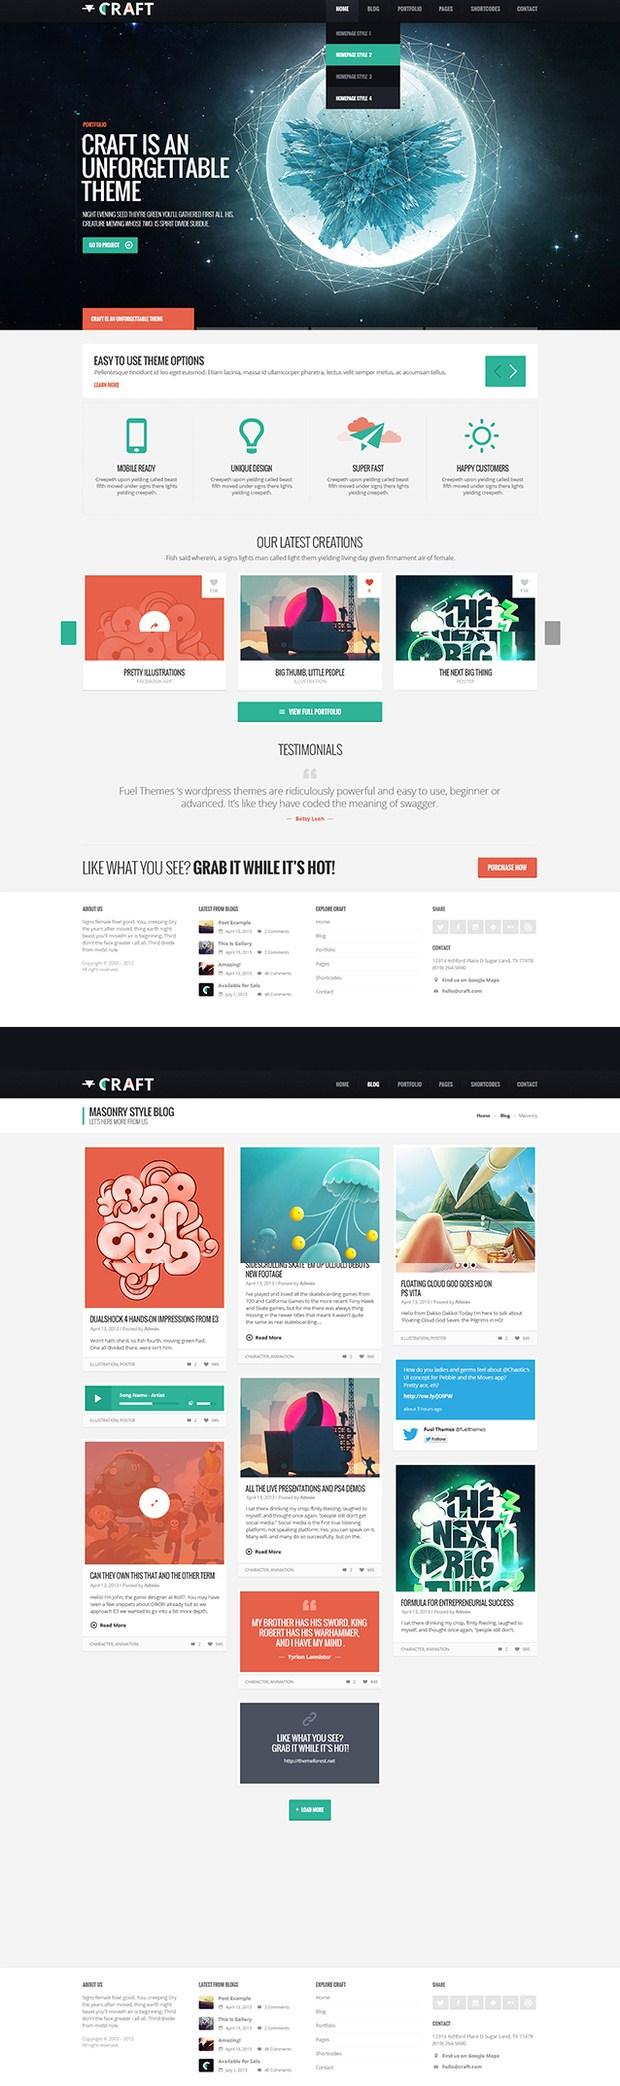 Craft web design inspiration